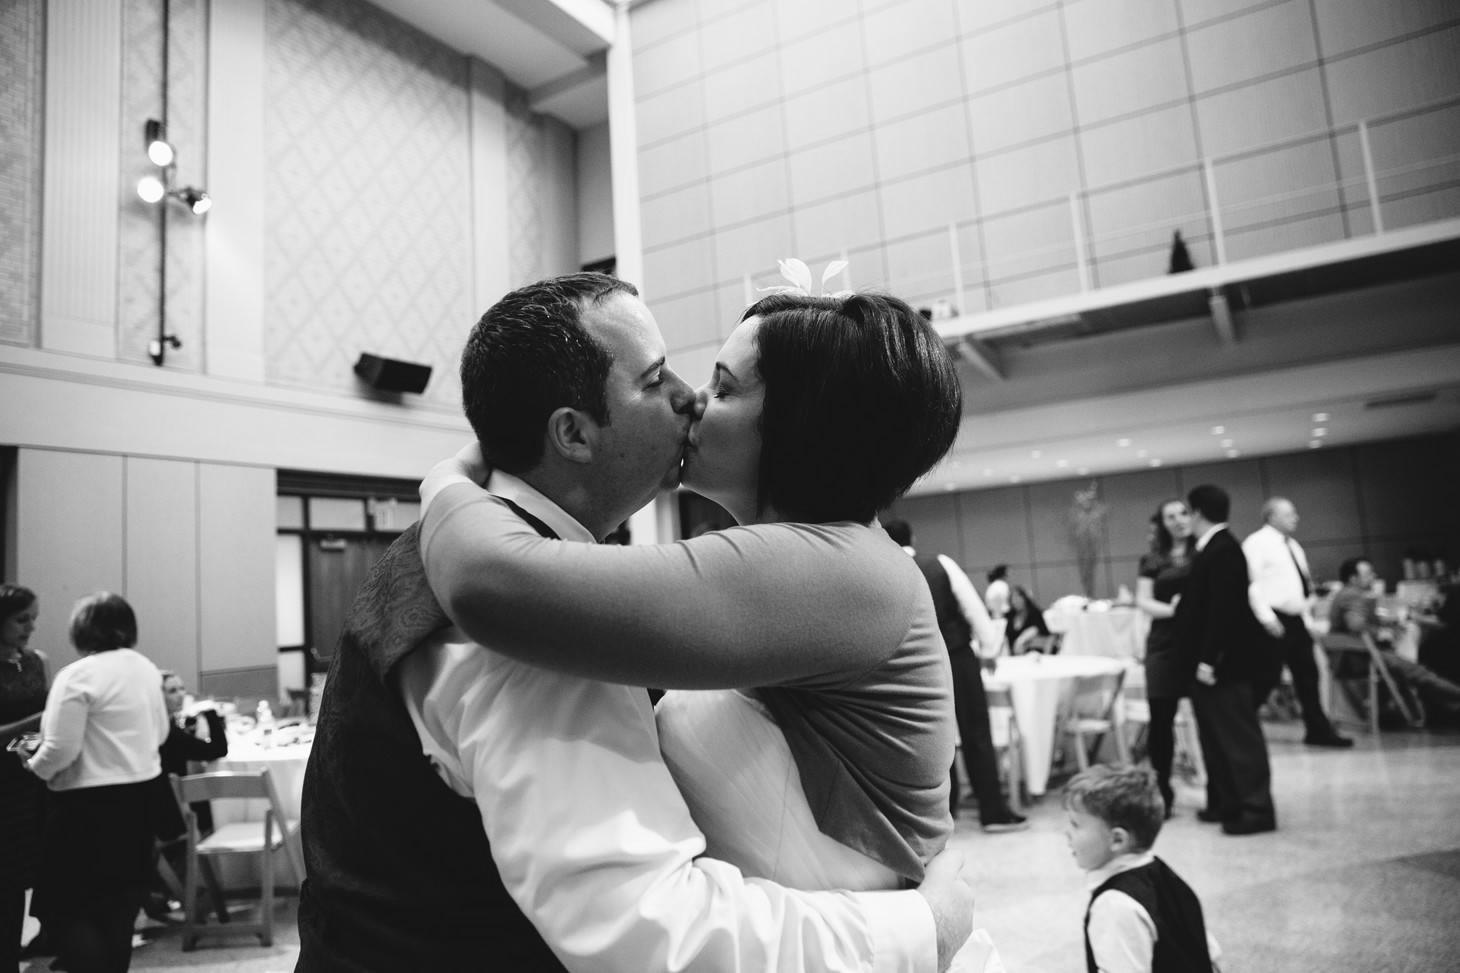 078-nyc-wedding-photographer-smitten-chickens-nj-montclair-art-museum.jpg